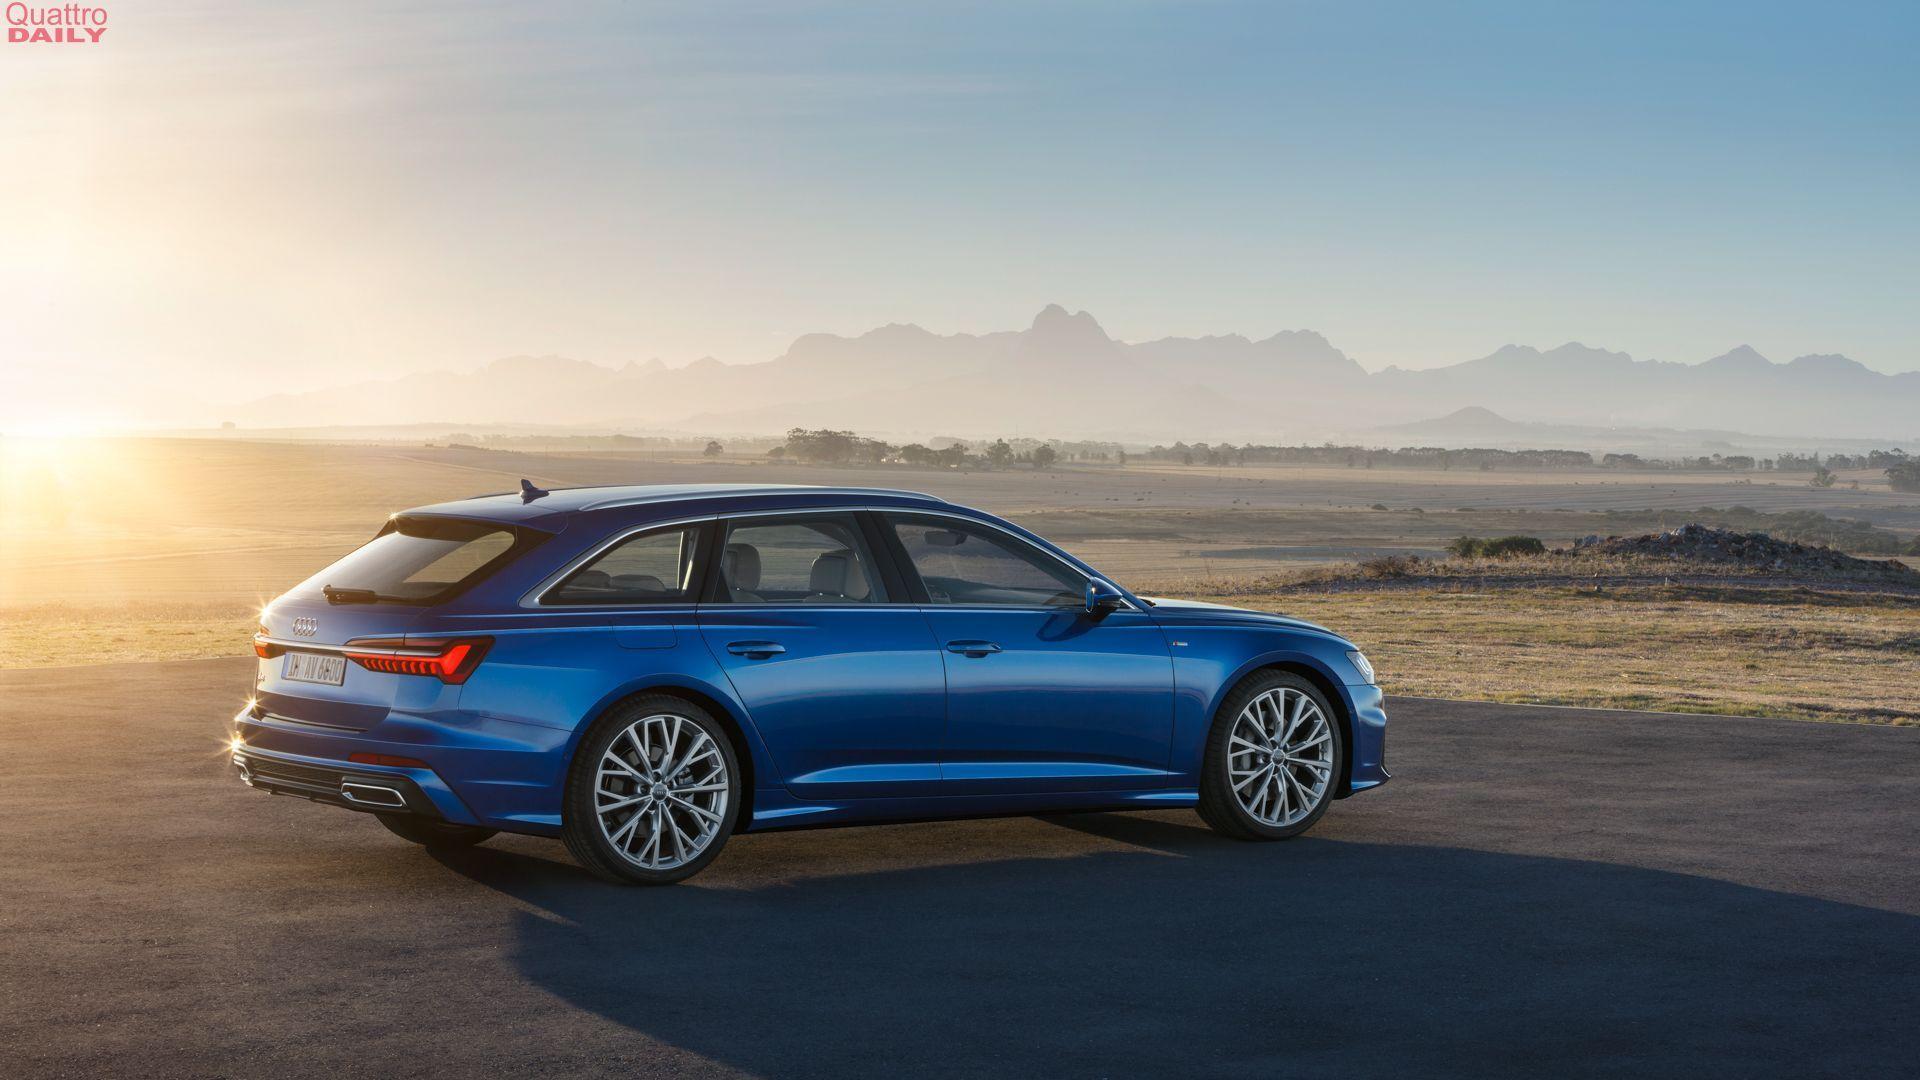 2020 Audi Rs6 Avant 2020 Audi Rs6 Avant 2020 Audi Rs6 Avant Price 2020 Audi Audi Audi Rs6 Audi A6 Avant